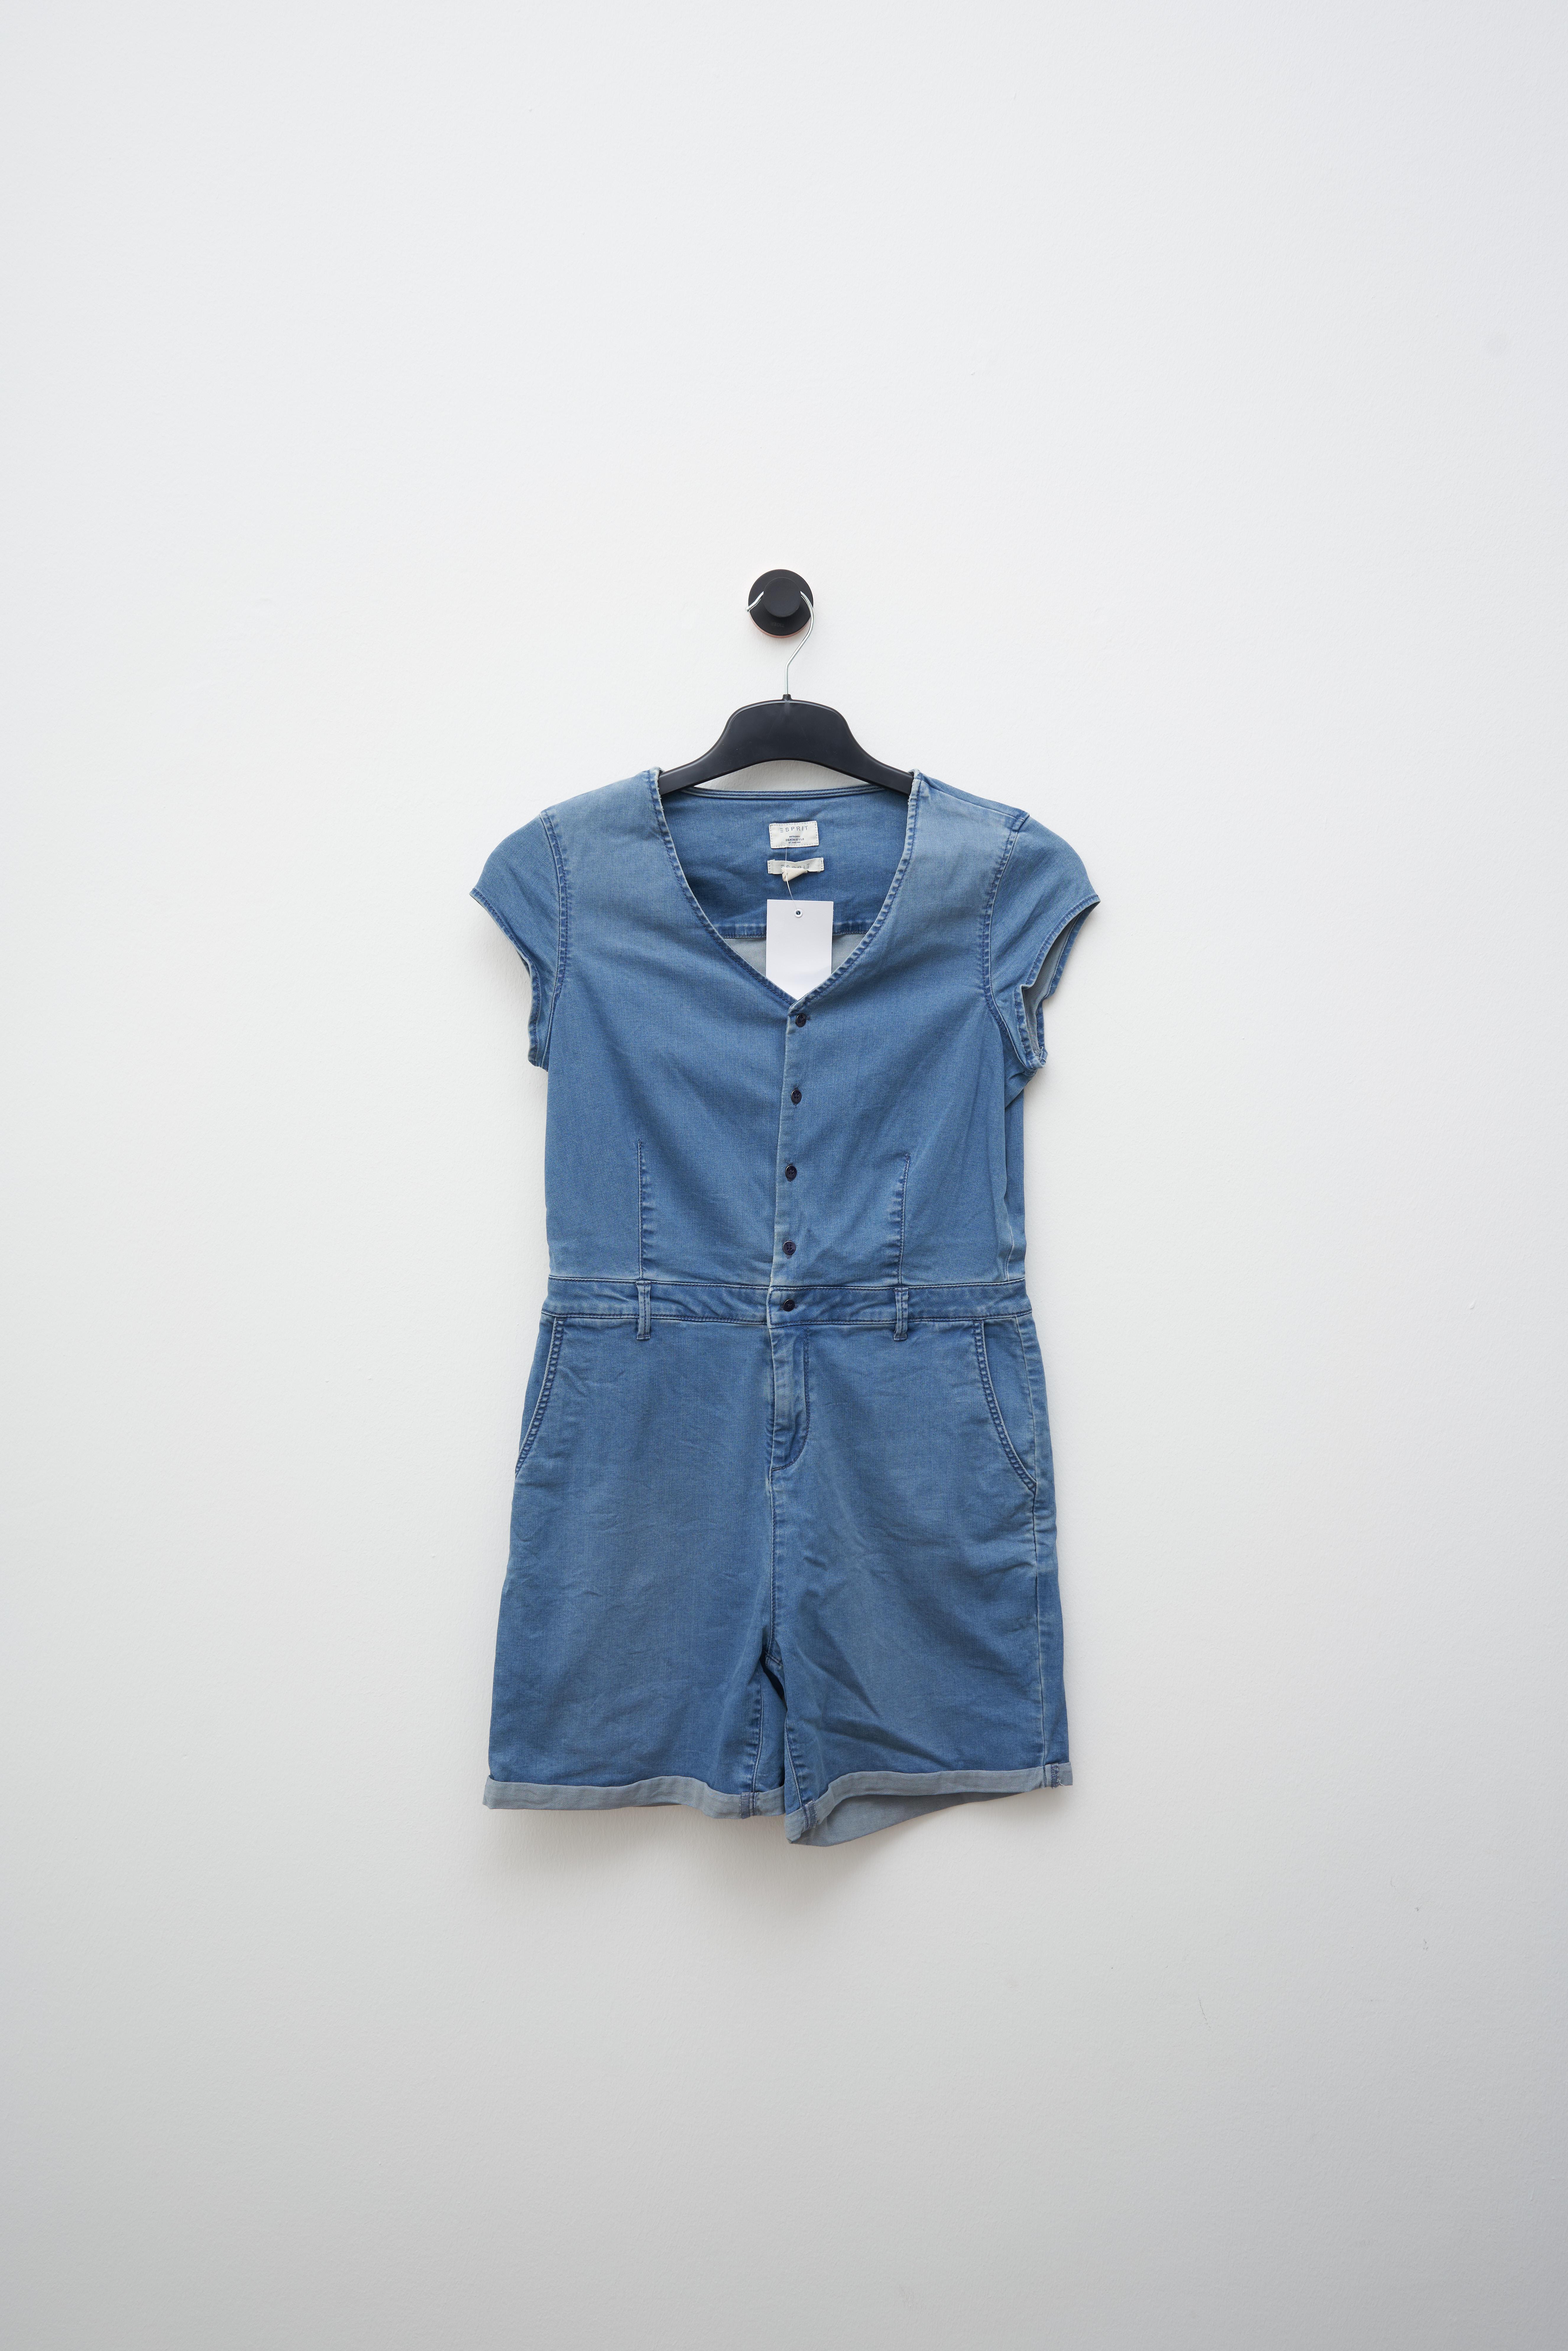 Esprit Jumpsuit / Overall Blau Gr.36